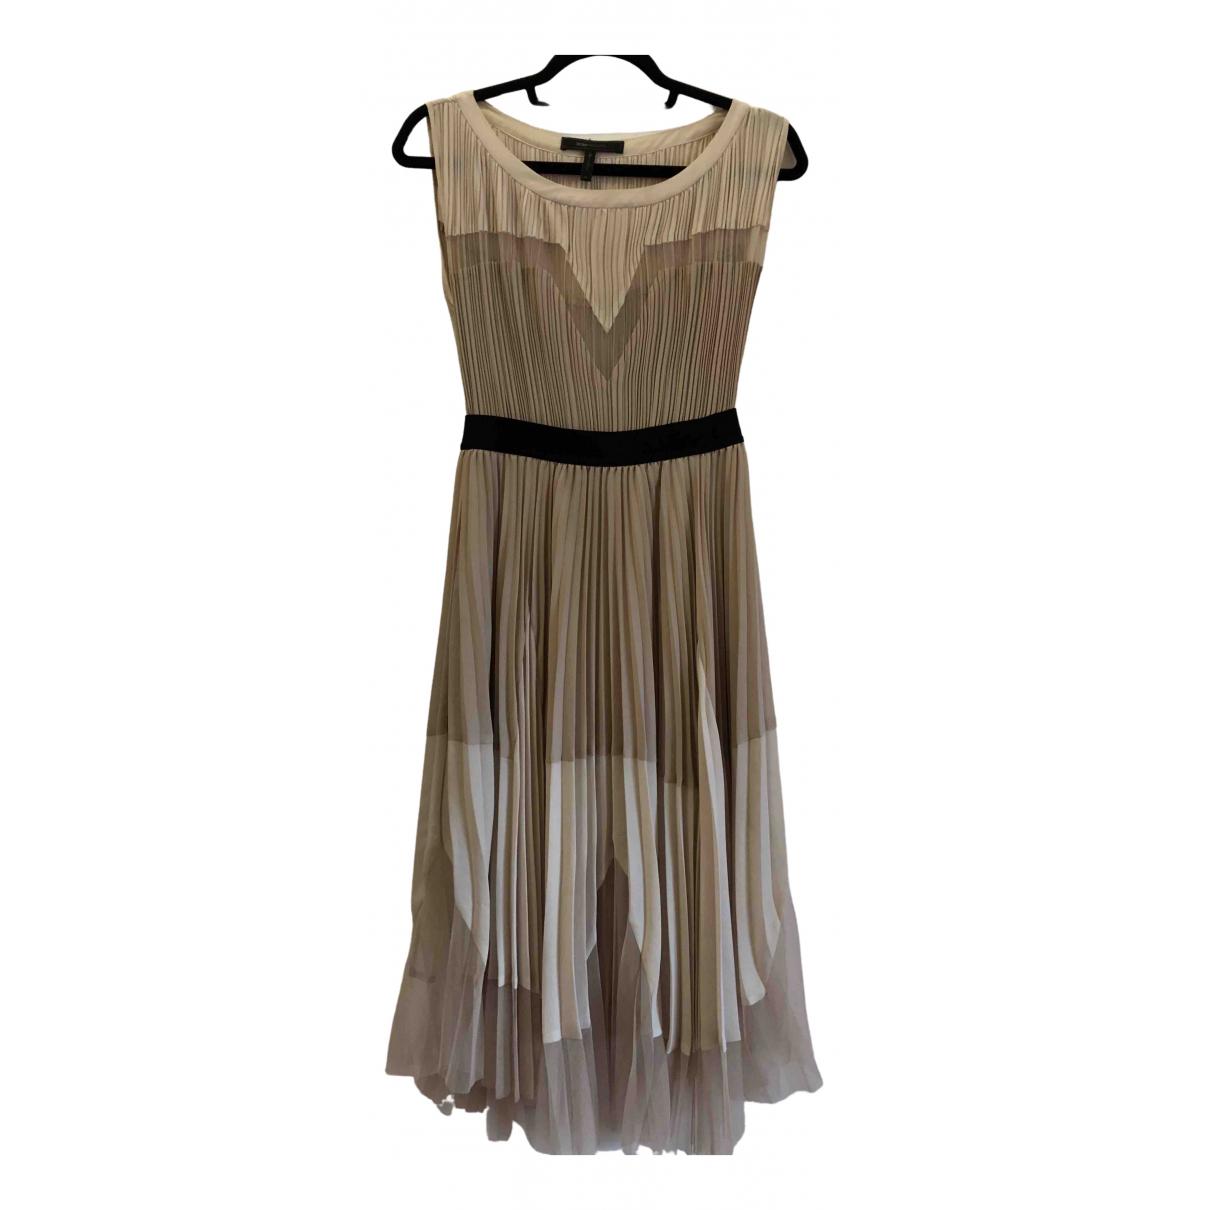 Bcbg Max Azria - Robe   pour femme - beige